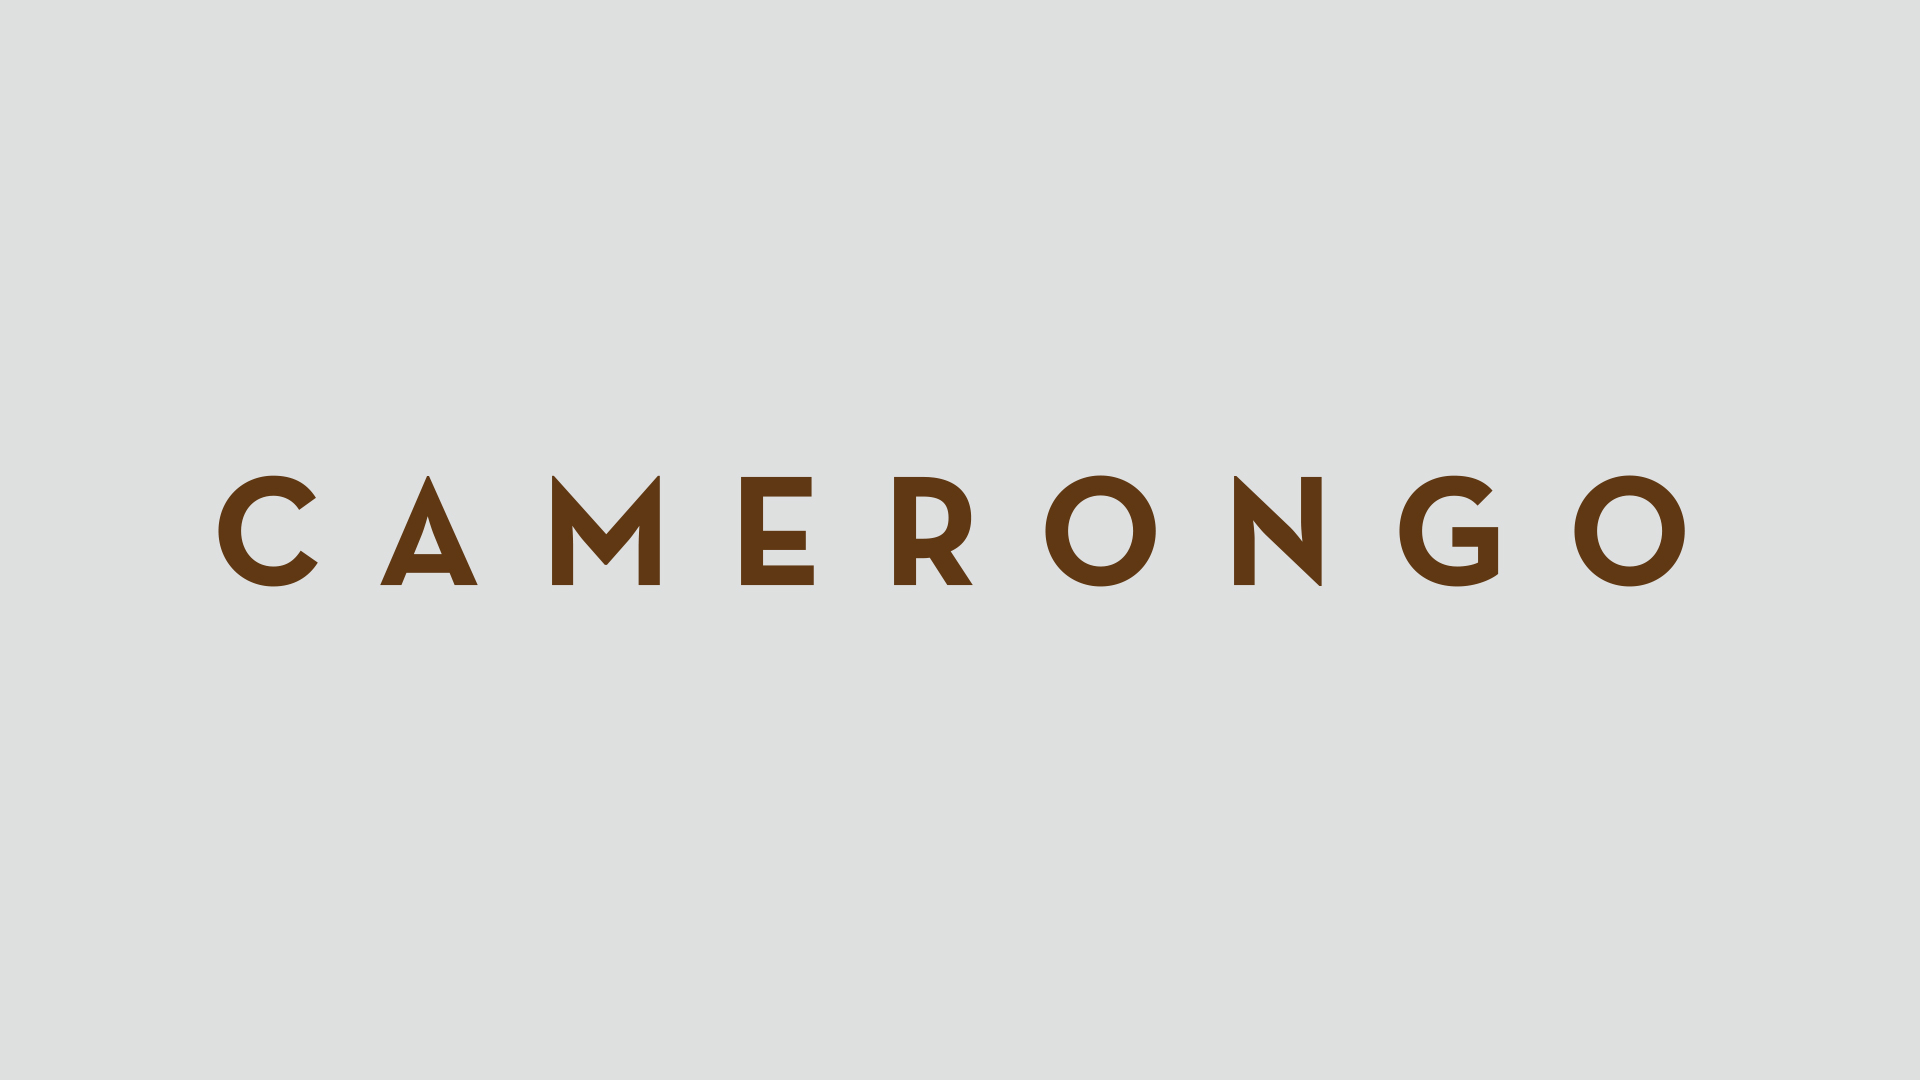 Camerongo Word Mark.jpg